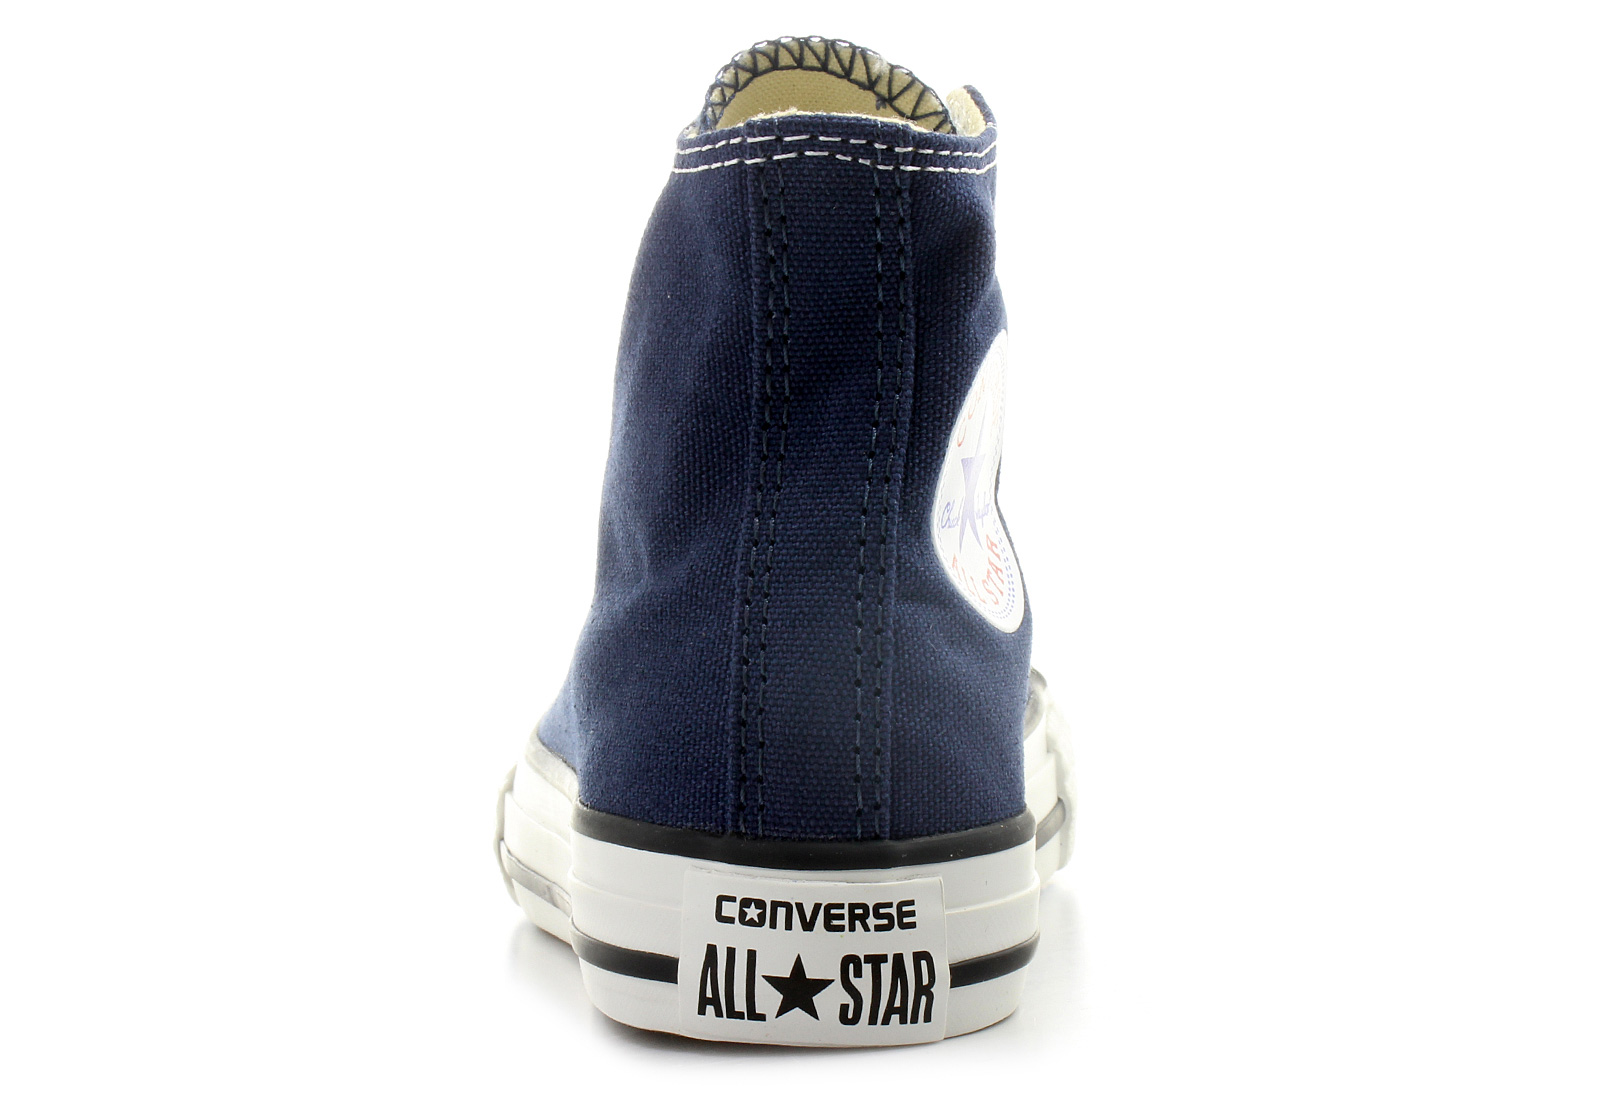 Converse Tenisky - Chuck Taylor All Star Youth Hi - 3J233C - Tenisky ... 6c5939957cd